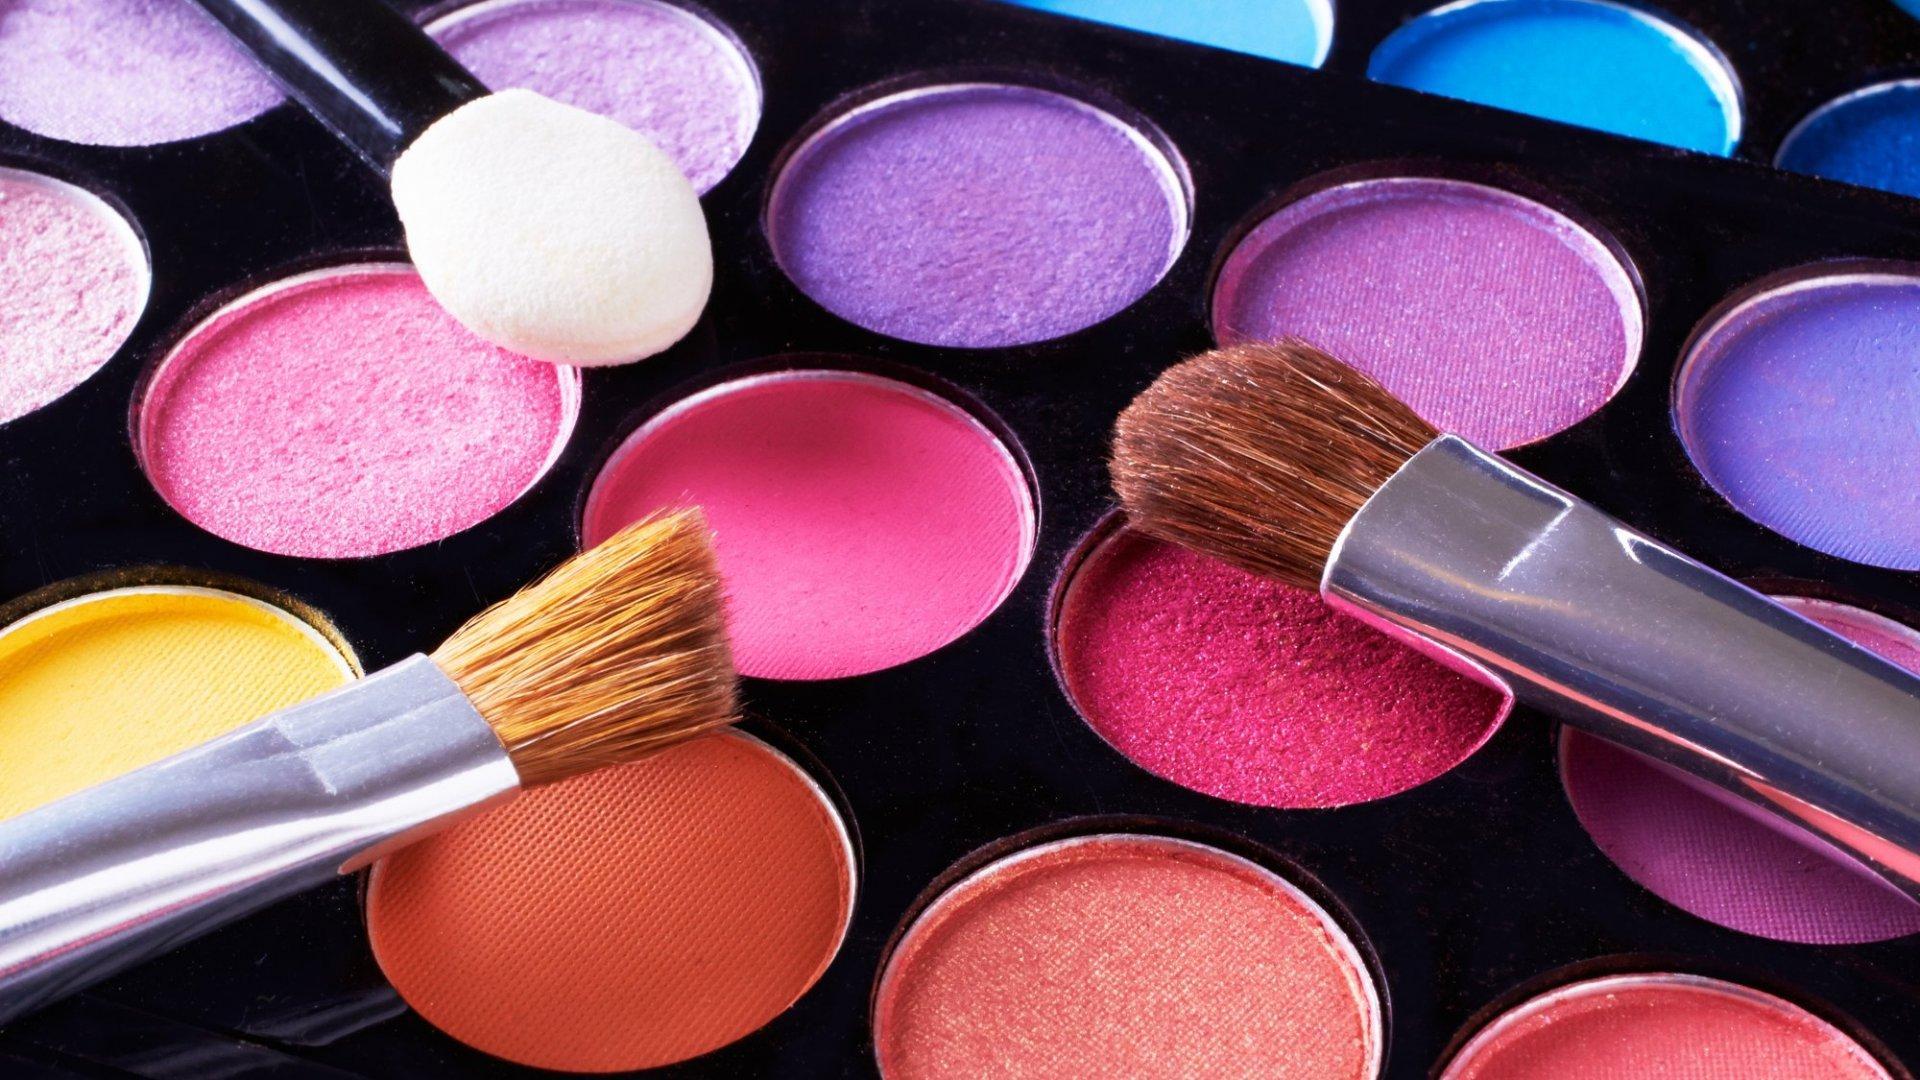 How Mona Kattan Harnessed a Corner of the $445 Billion Beauty Industry